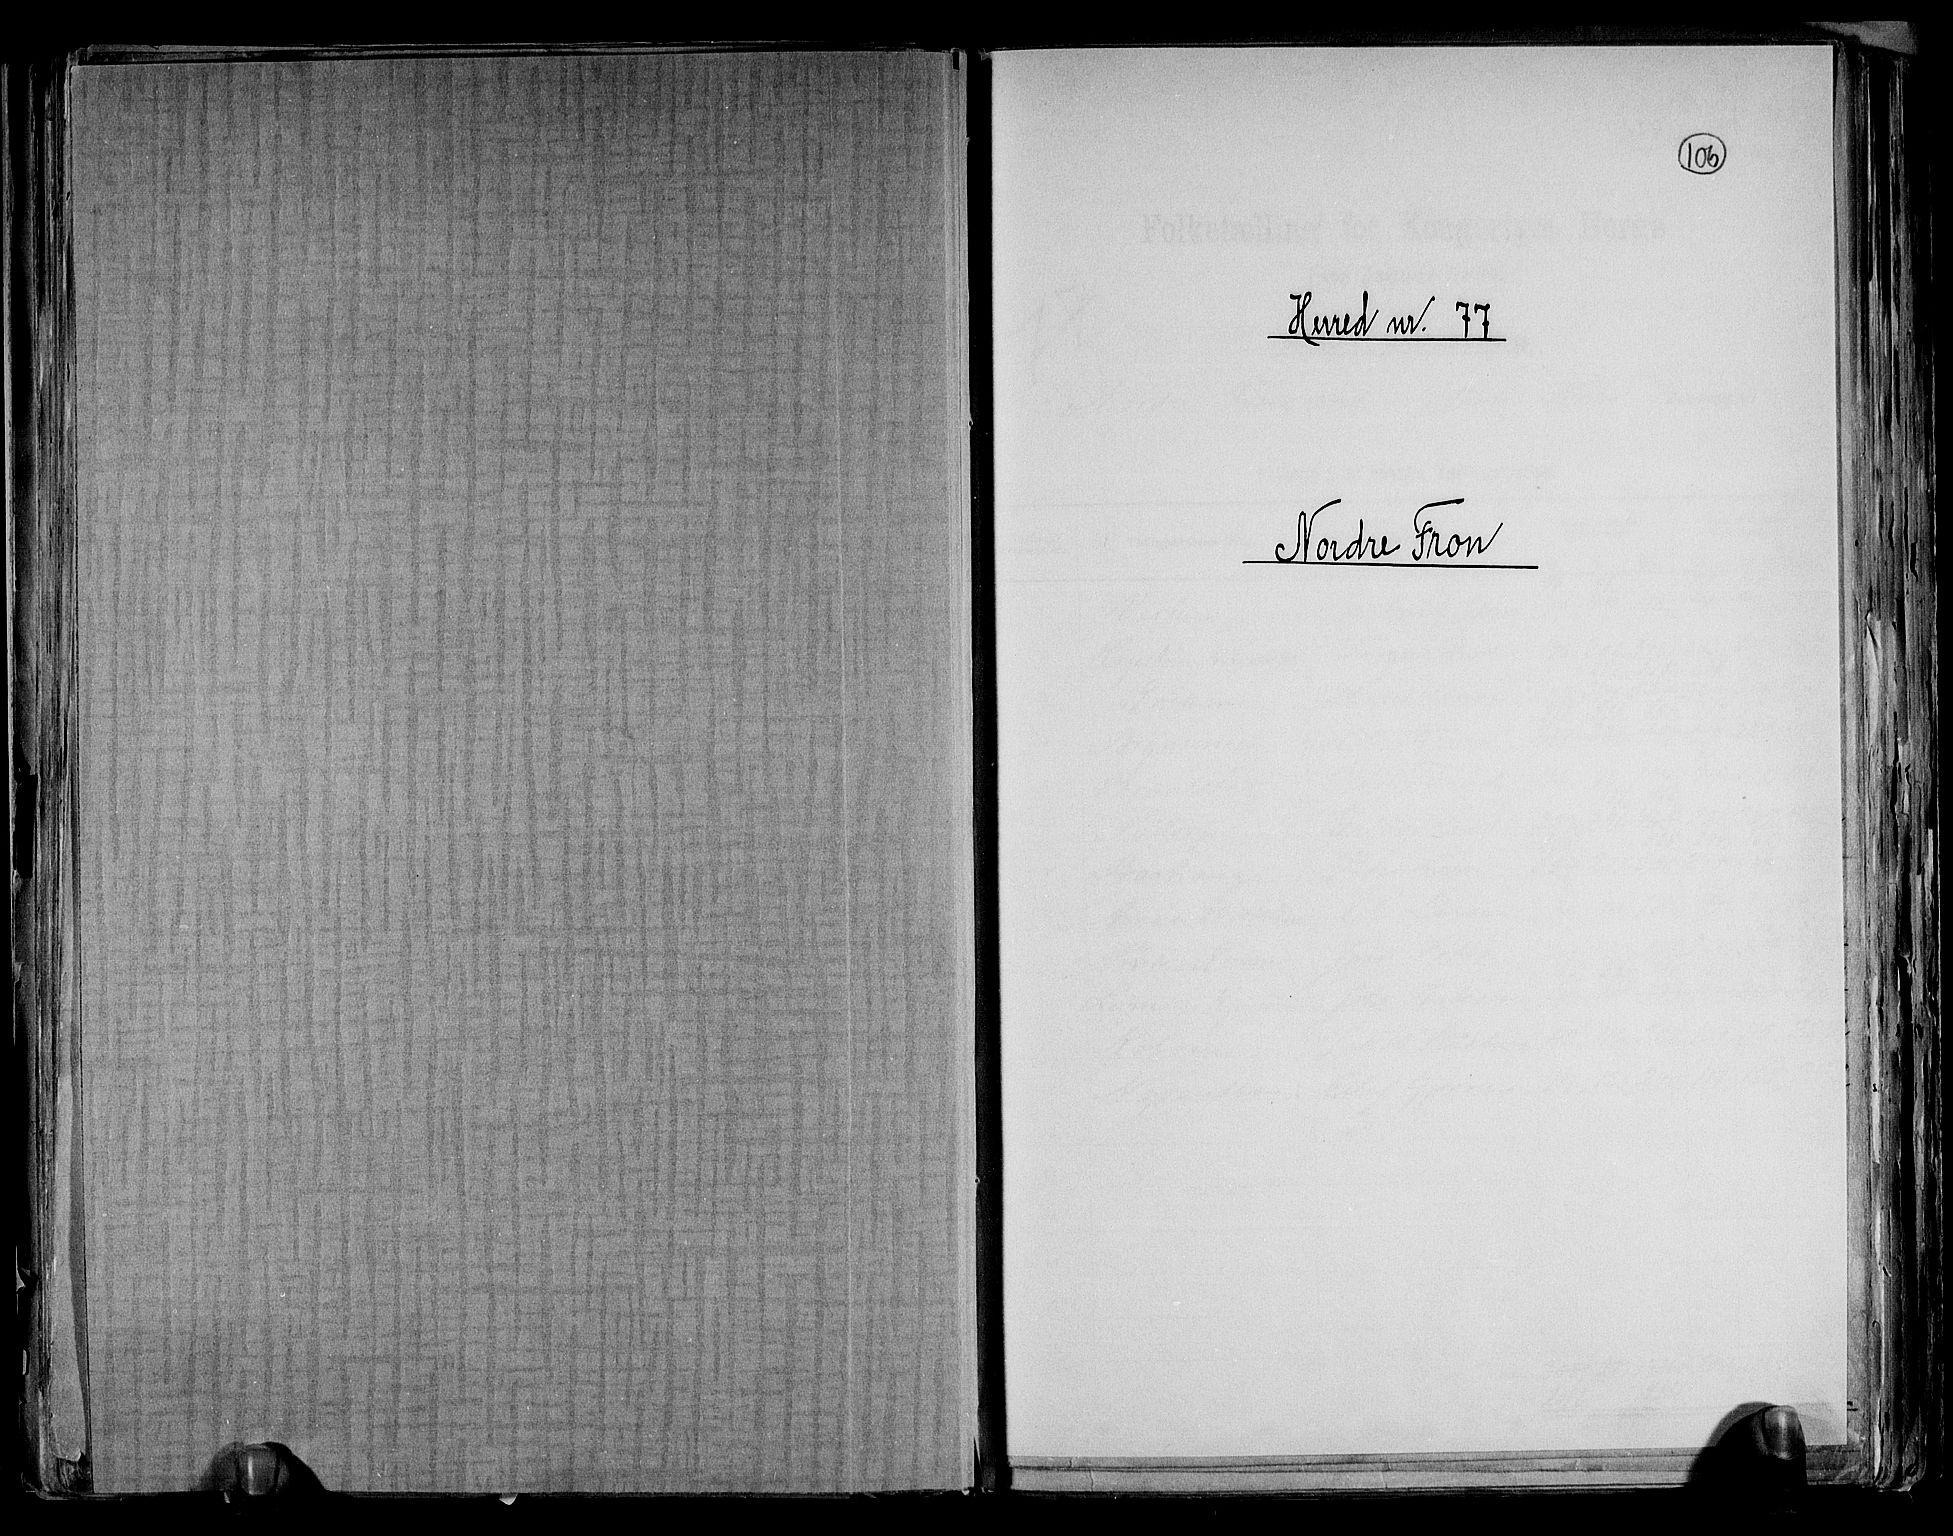 RA, Folketelling 1891 for 0518 Nord-Fron herred, 1891, s. 1